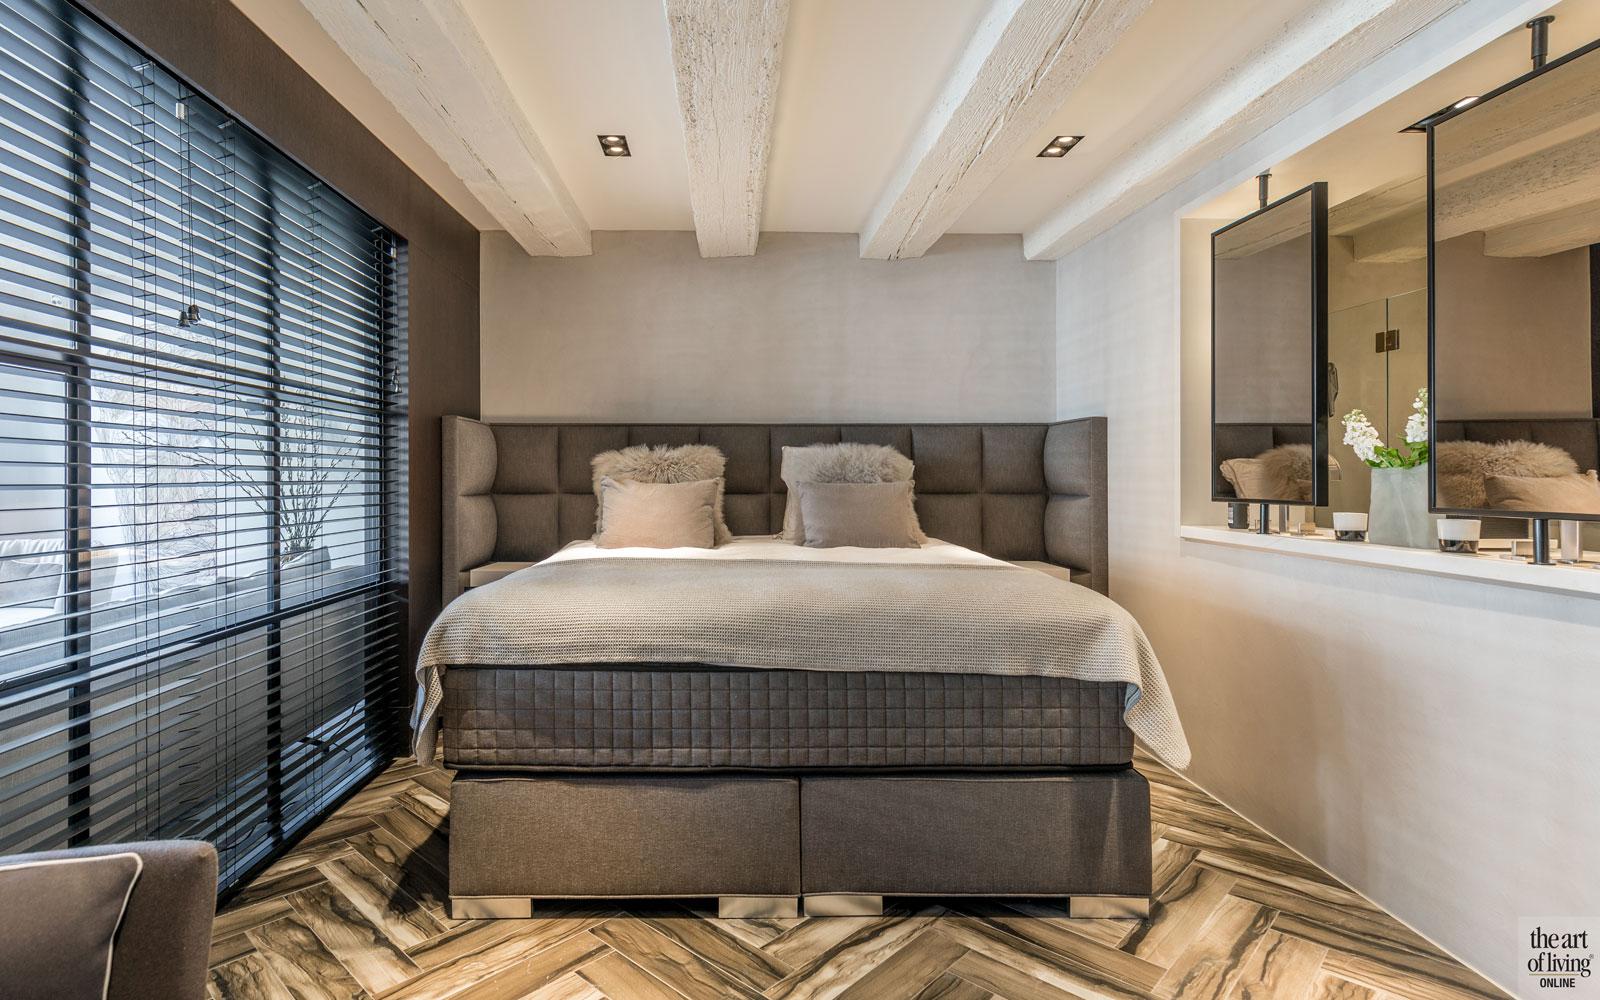 Slaapkamer, boxspring, bed, master bedroom, glazen box, shutters, vloer, visgraat, sfeervolle loft, Studio Vendrig